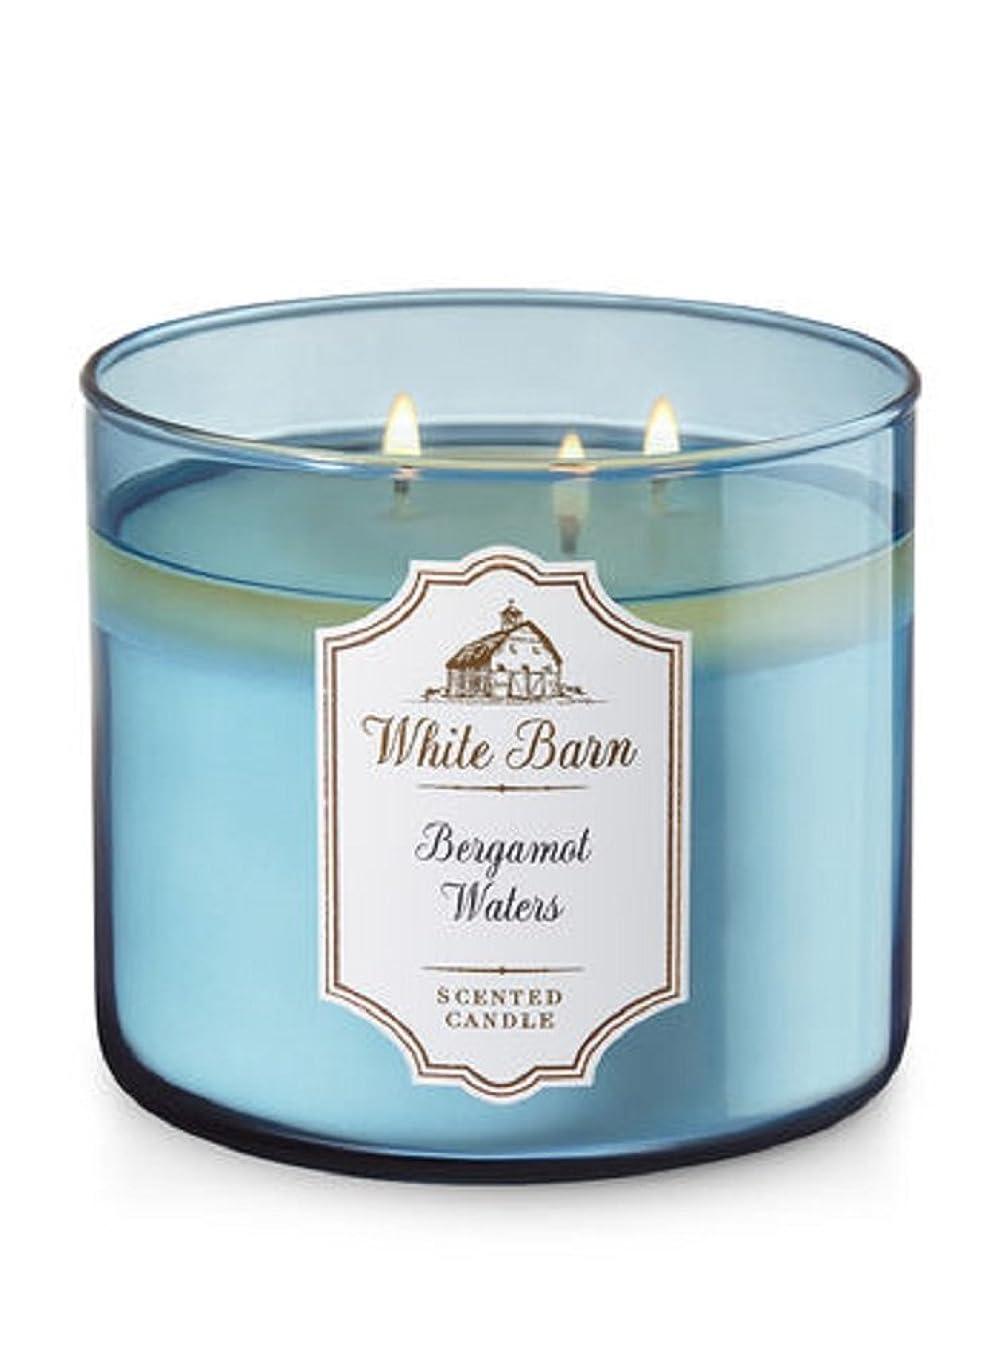 Bath & Body Works 3-Wick Candle in Bergamot Waters